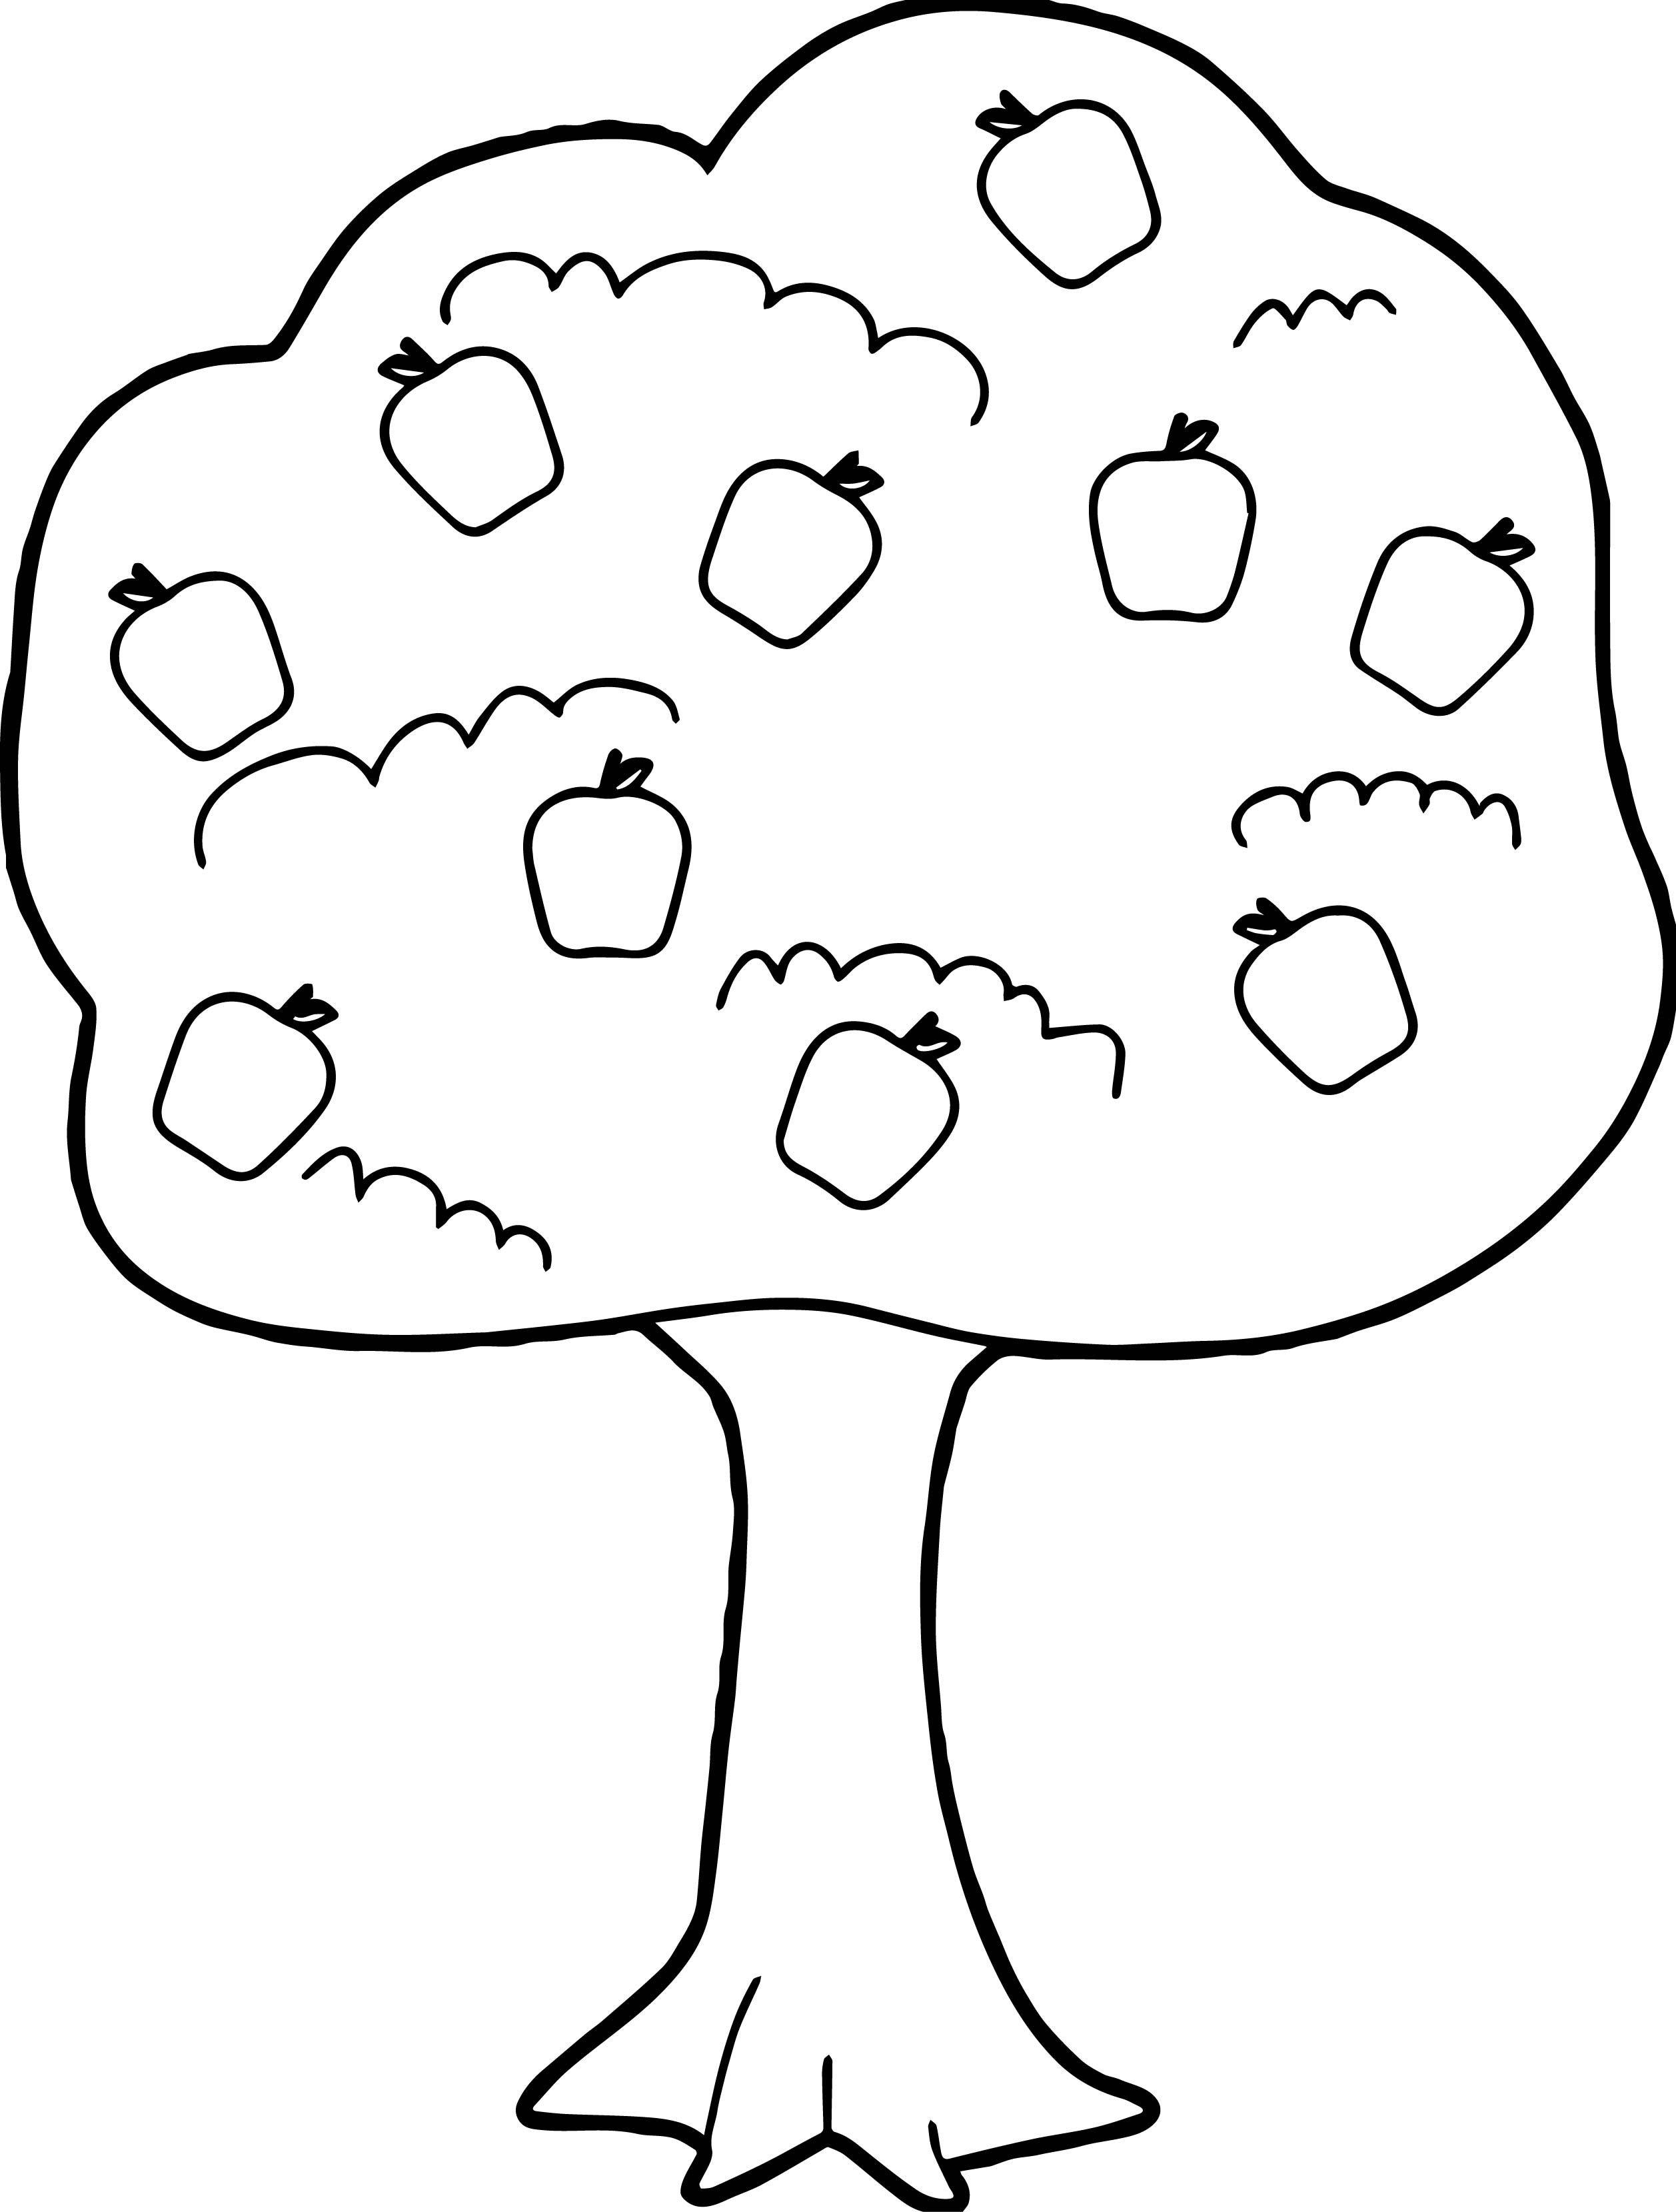 Nice Cute Apple Tree Coloring Page Apple Coloring Pages Tree Coloring Page Fall Coloring Pages